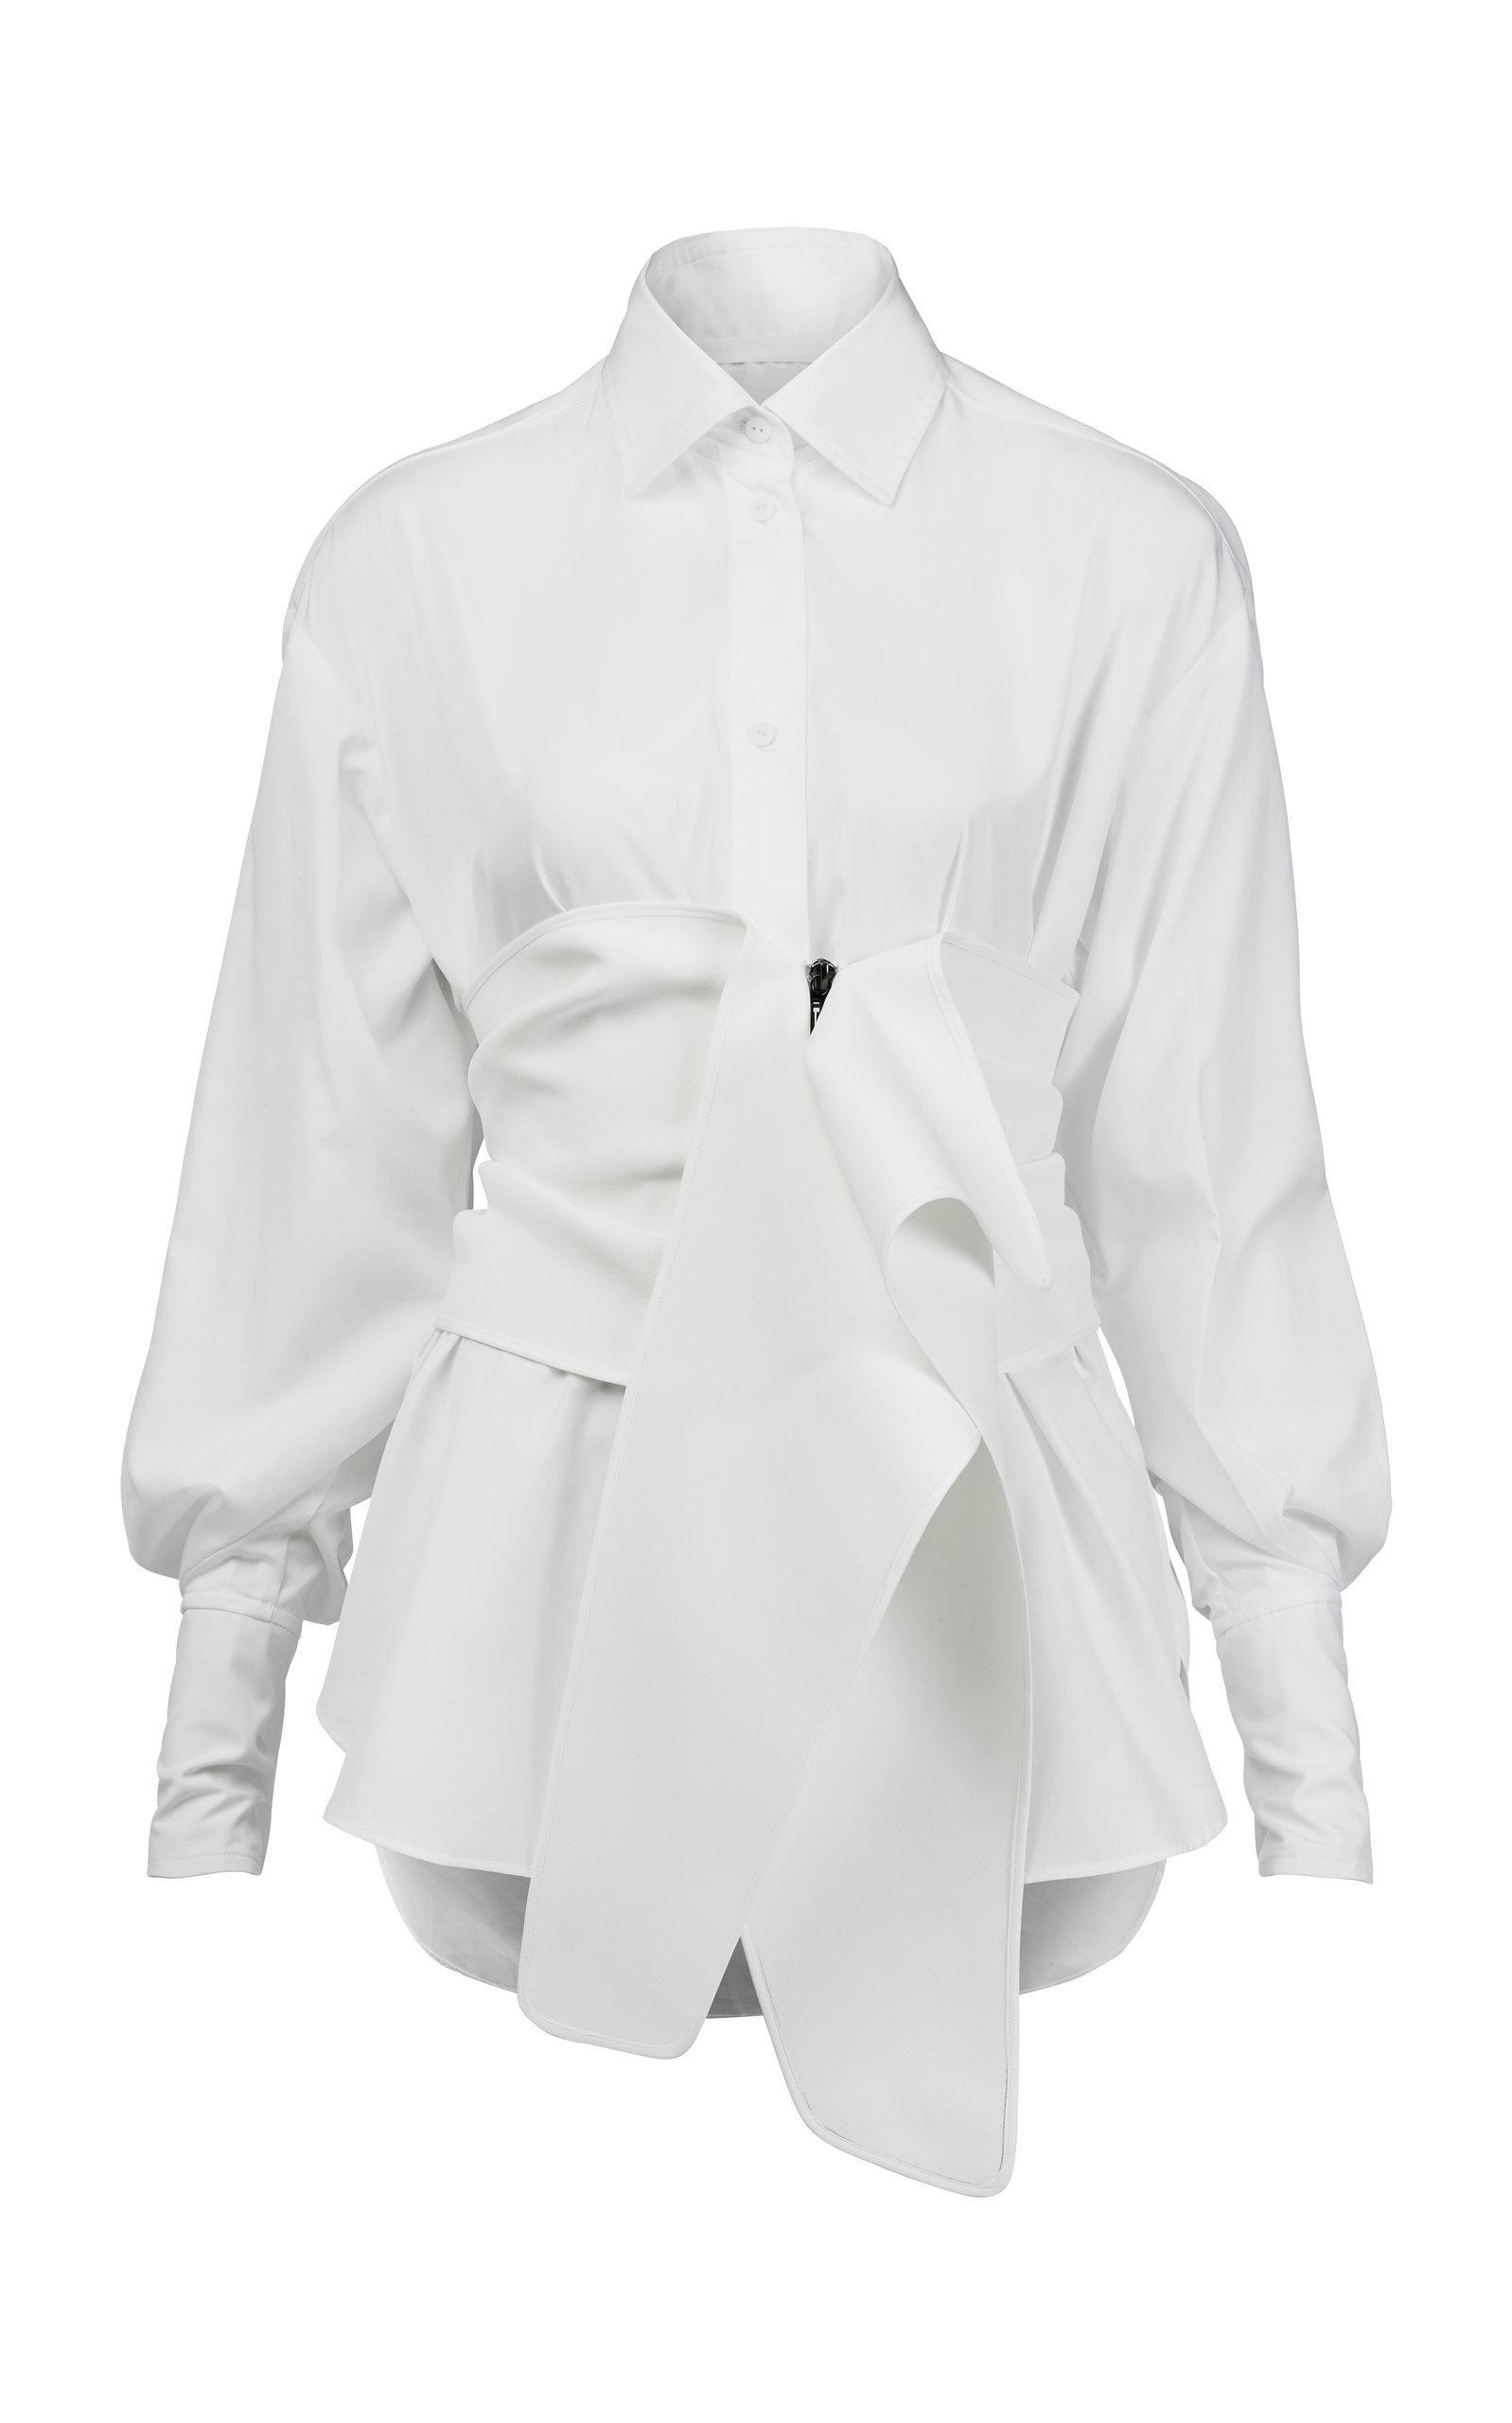 Faithful Collared Shirt With Cummerbund Maticevski Cheap Sale Explore With Mastercard SaJ3i